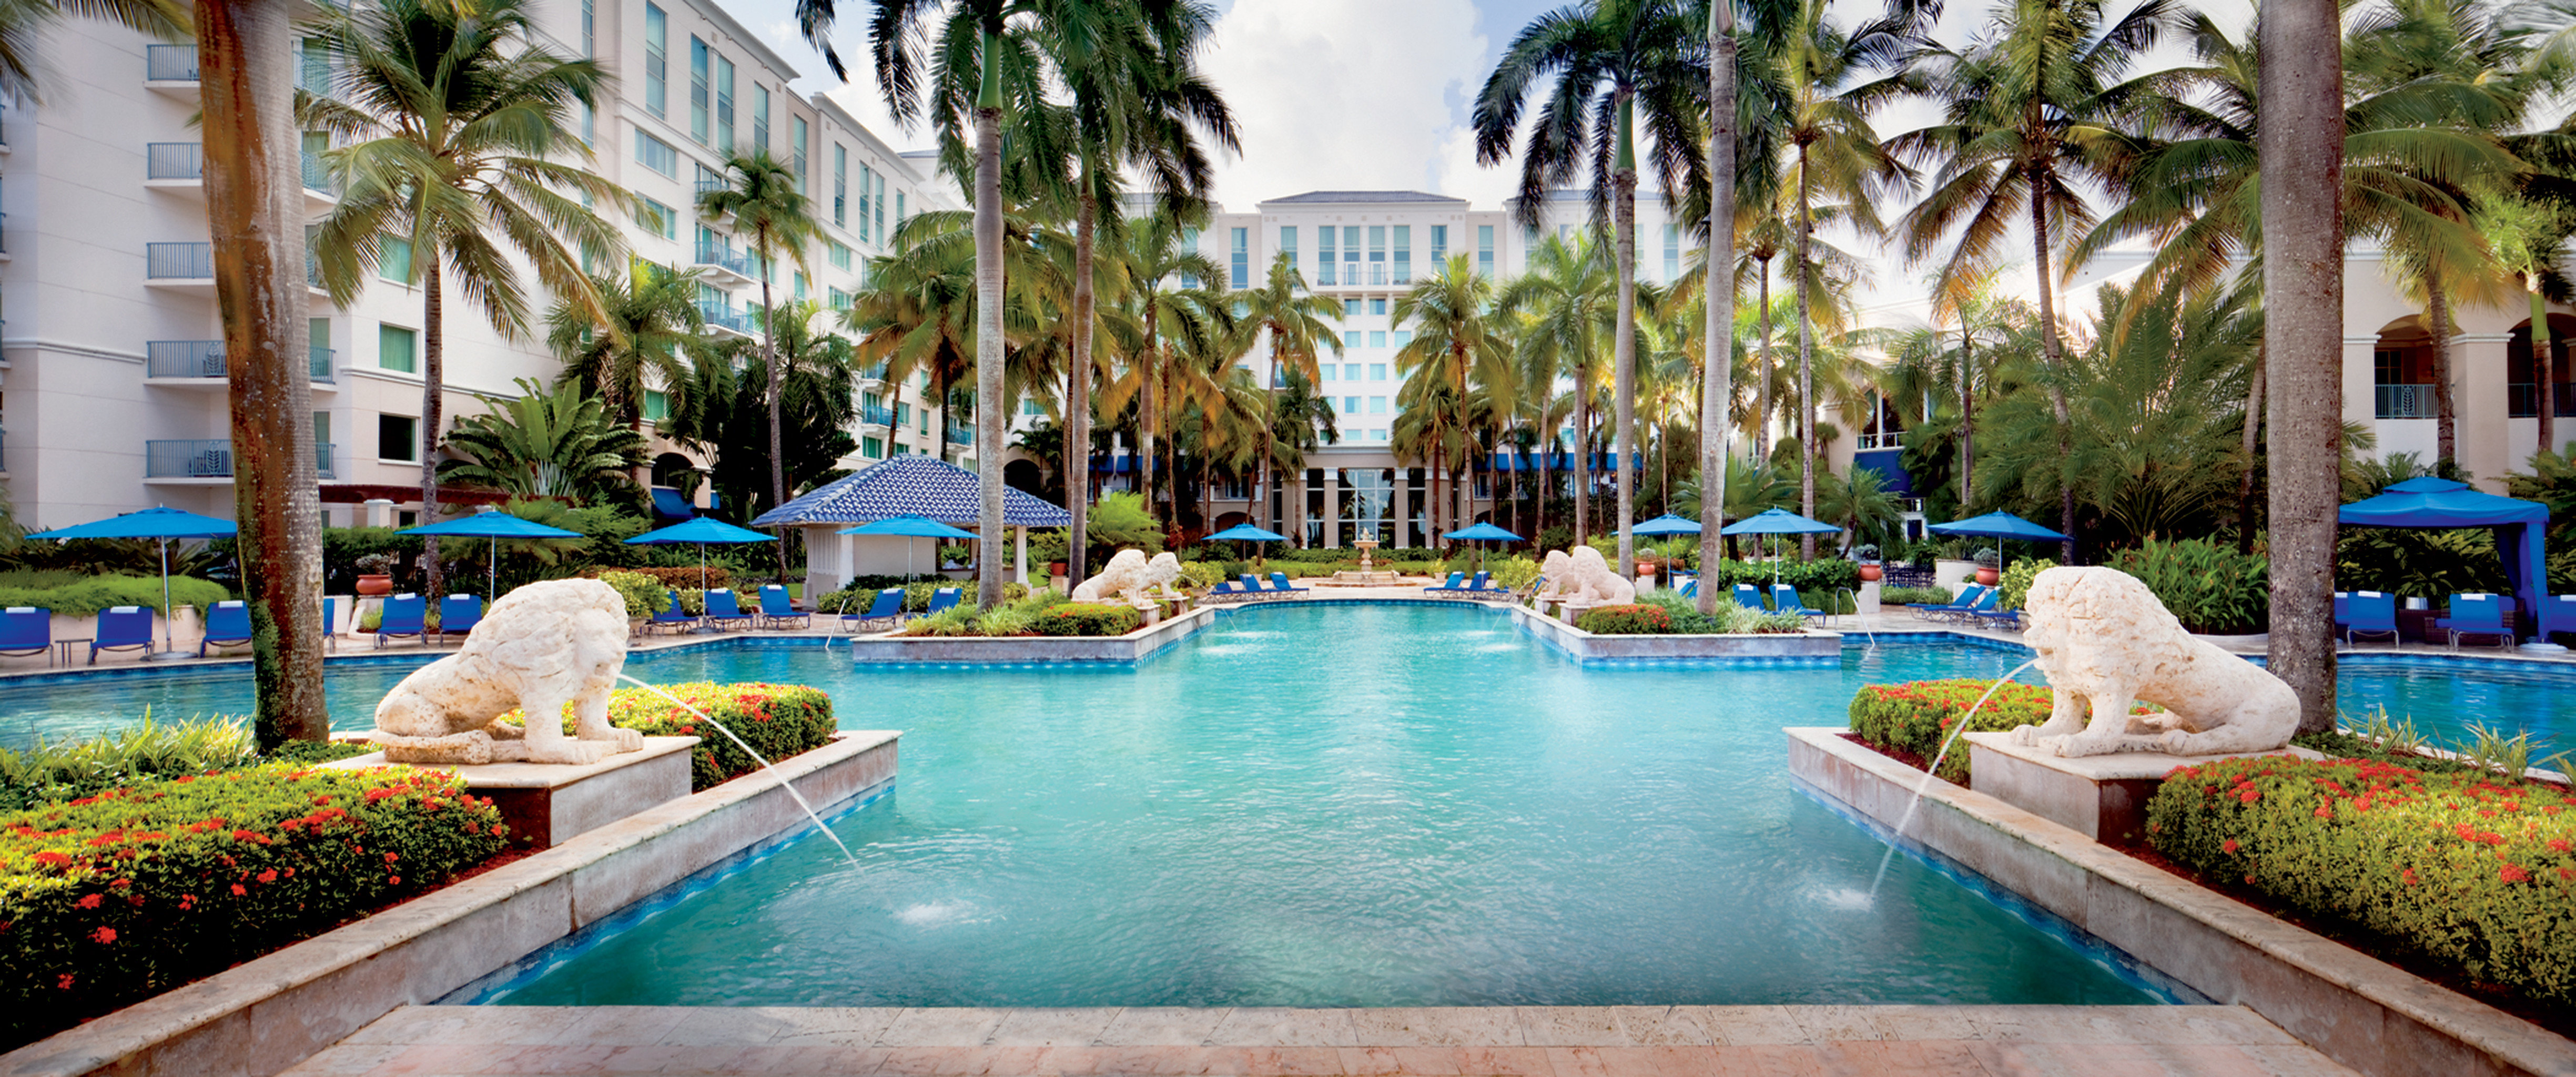 Architecture Exterior Jetsetter Guides Luxury Play Pool Resort tree swimming pool leisure property reflecting pool palace mansion Villa backyard condominium hacienda Water park Garden